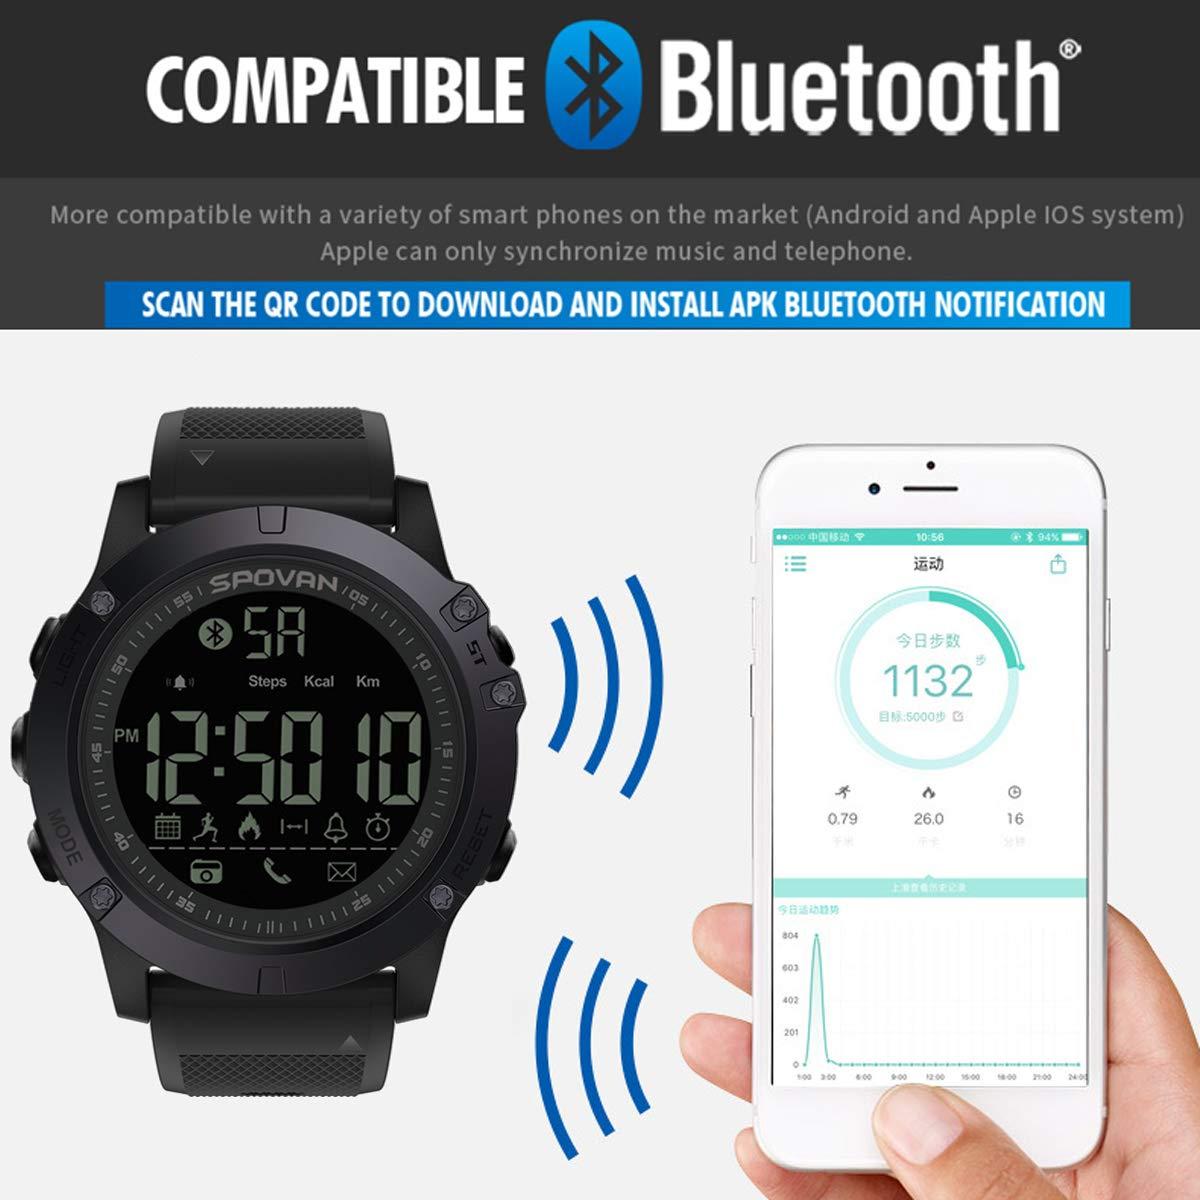 Amazon.com: Mens Sports Watch Bluetooth Activity Tracker Waterproof Digital Military Pedometer Calorie Counter Multifunction Wrist Smart Watch: Watches